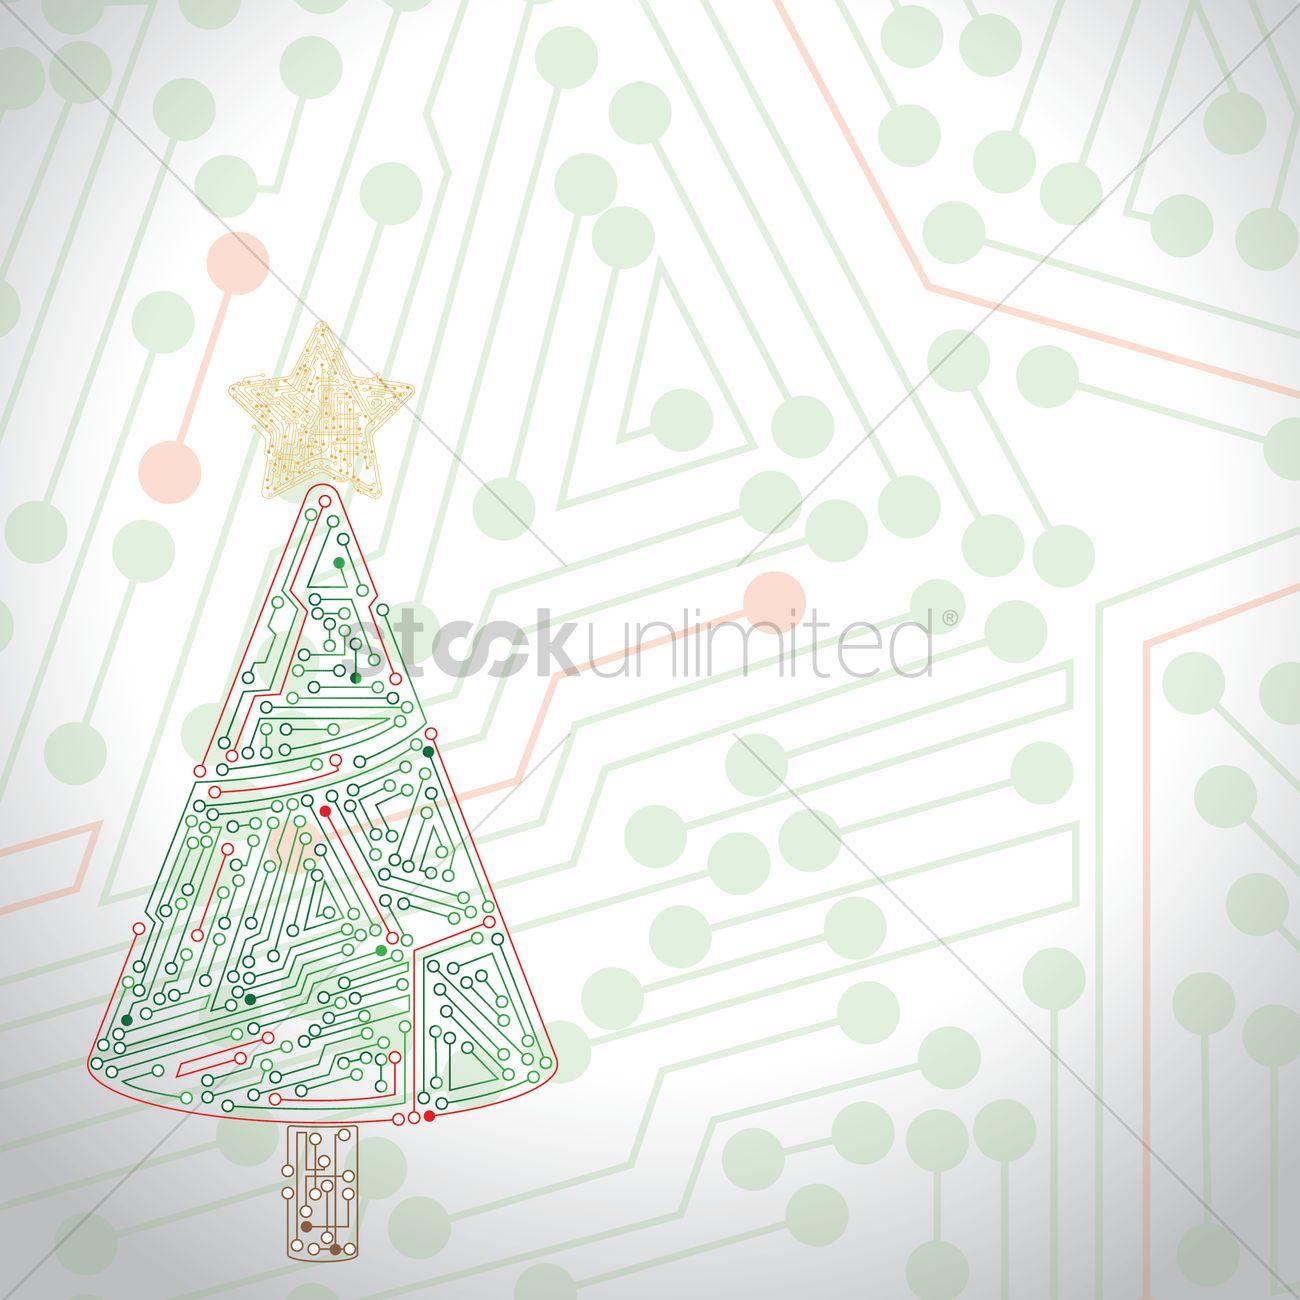 Christmas Board Design.Circuit Board Christmas Design Vector Image 1946107